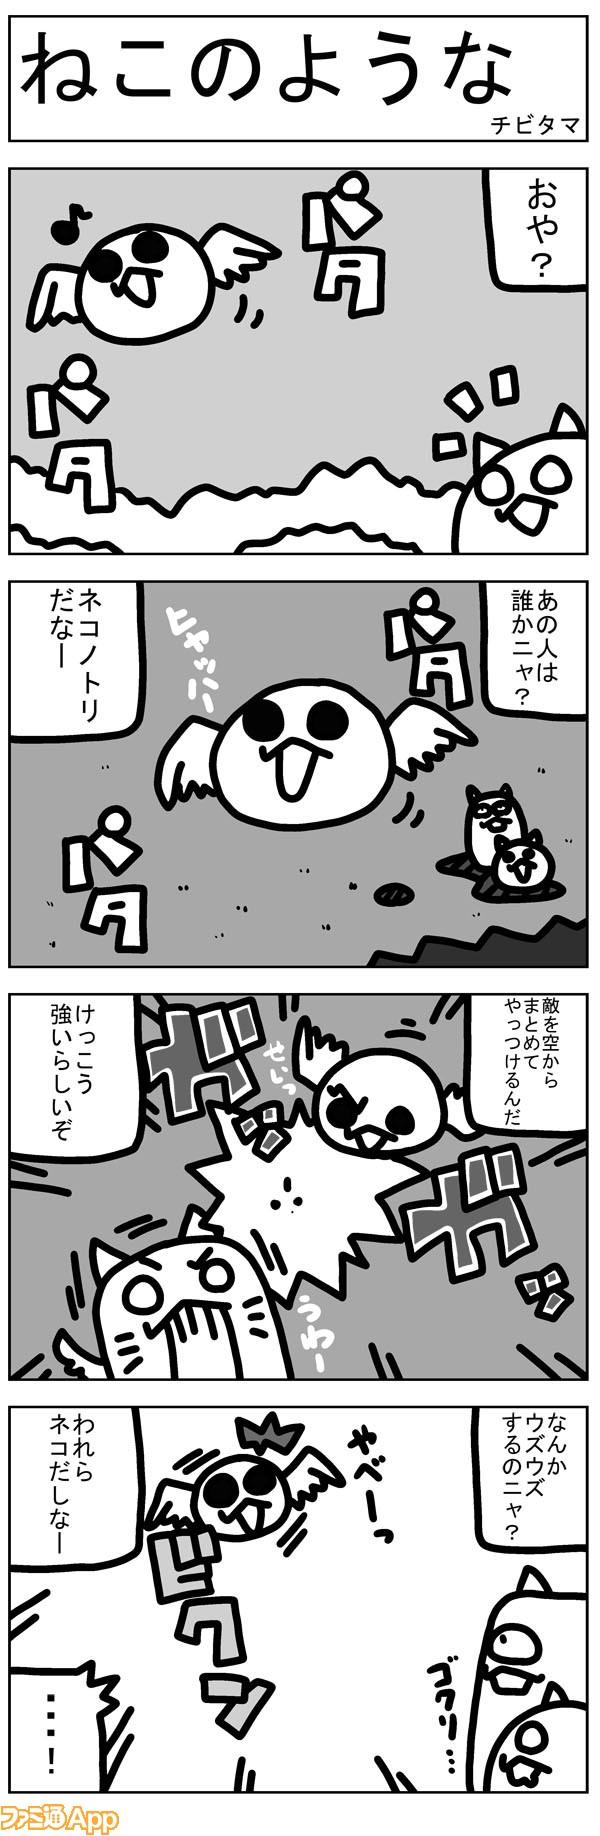 13tibi_004